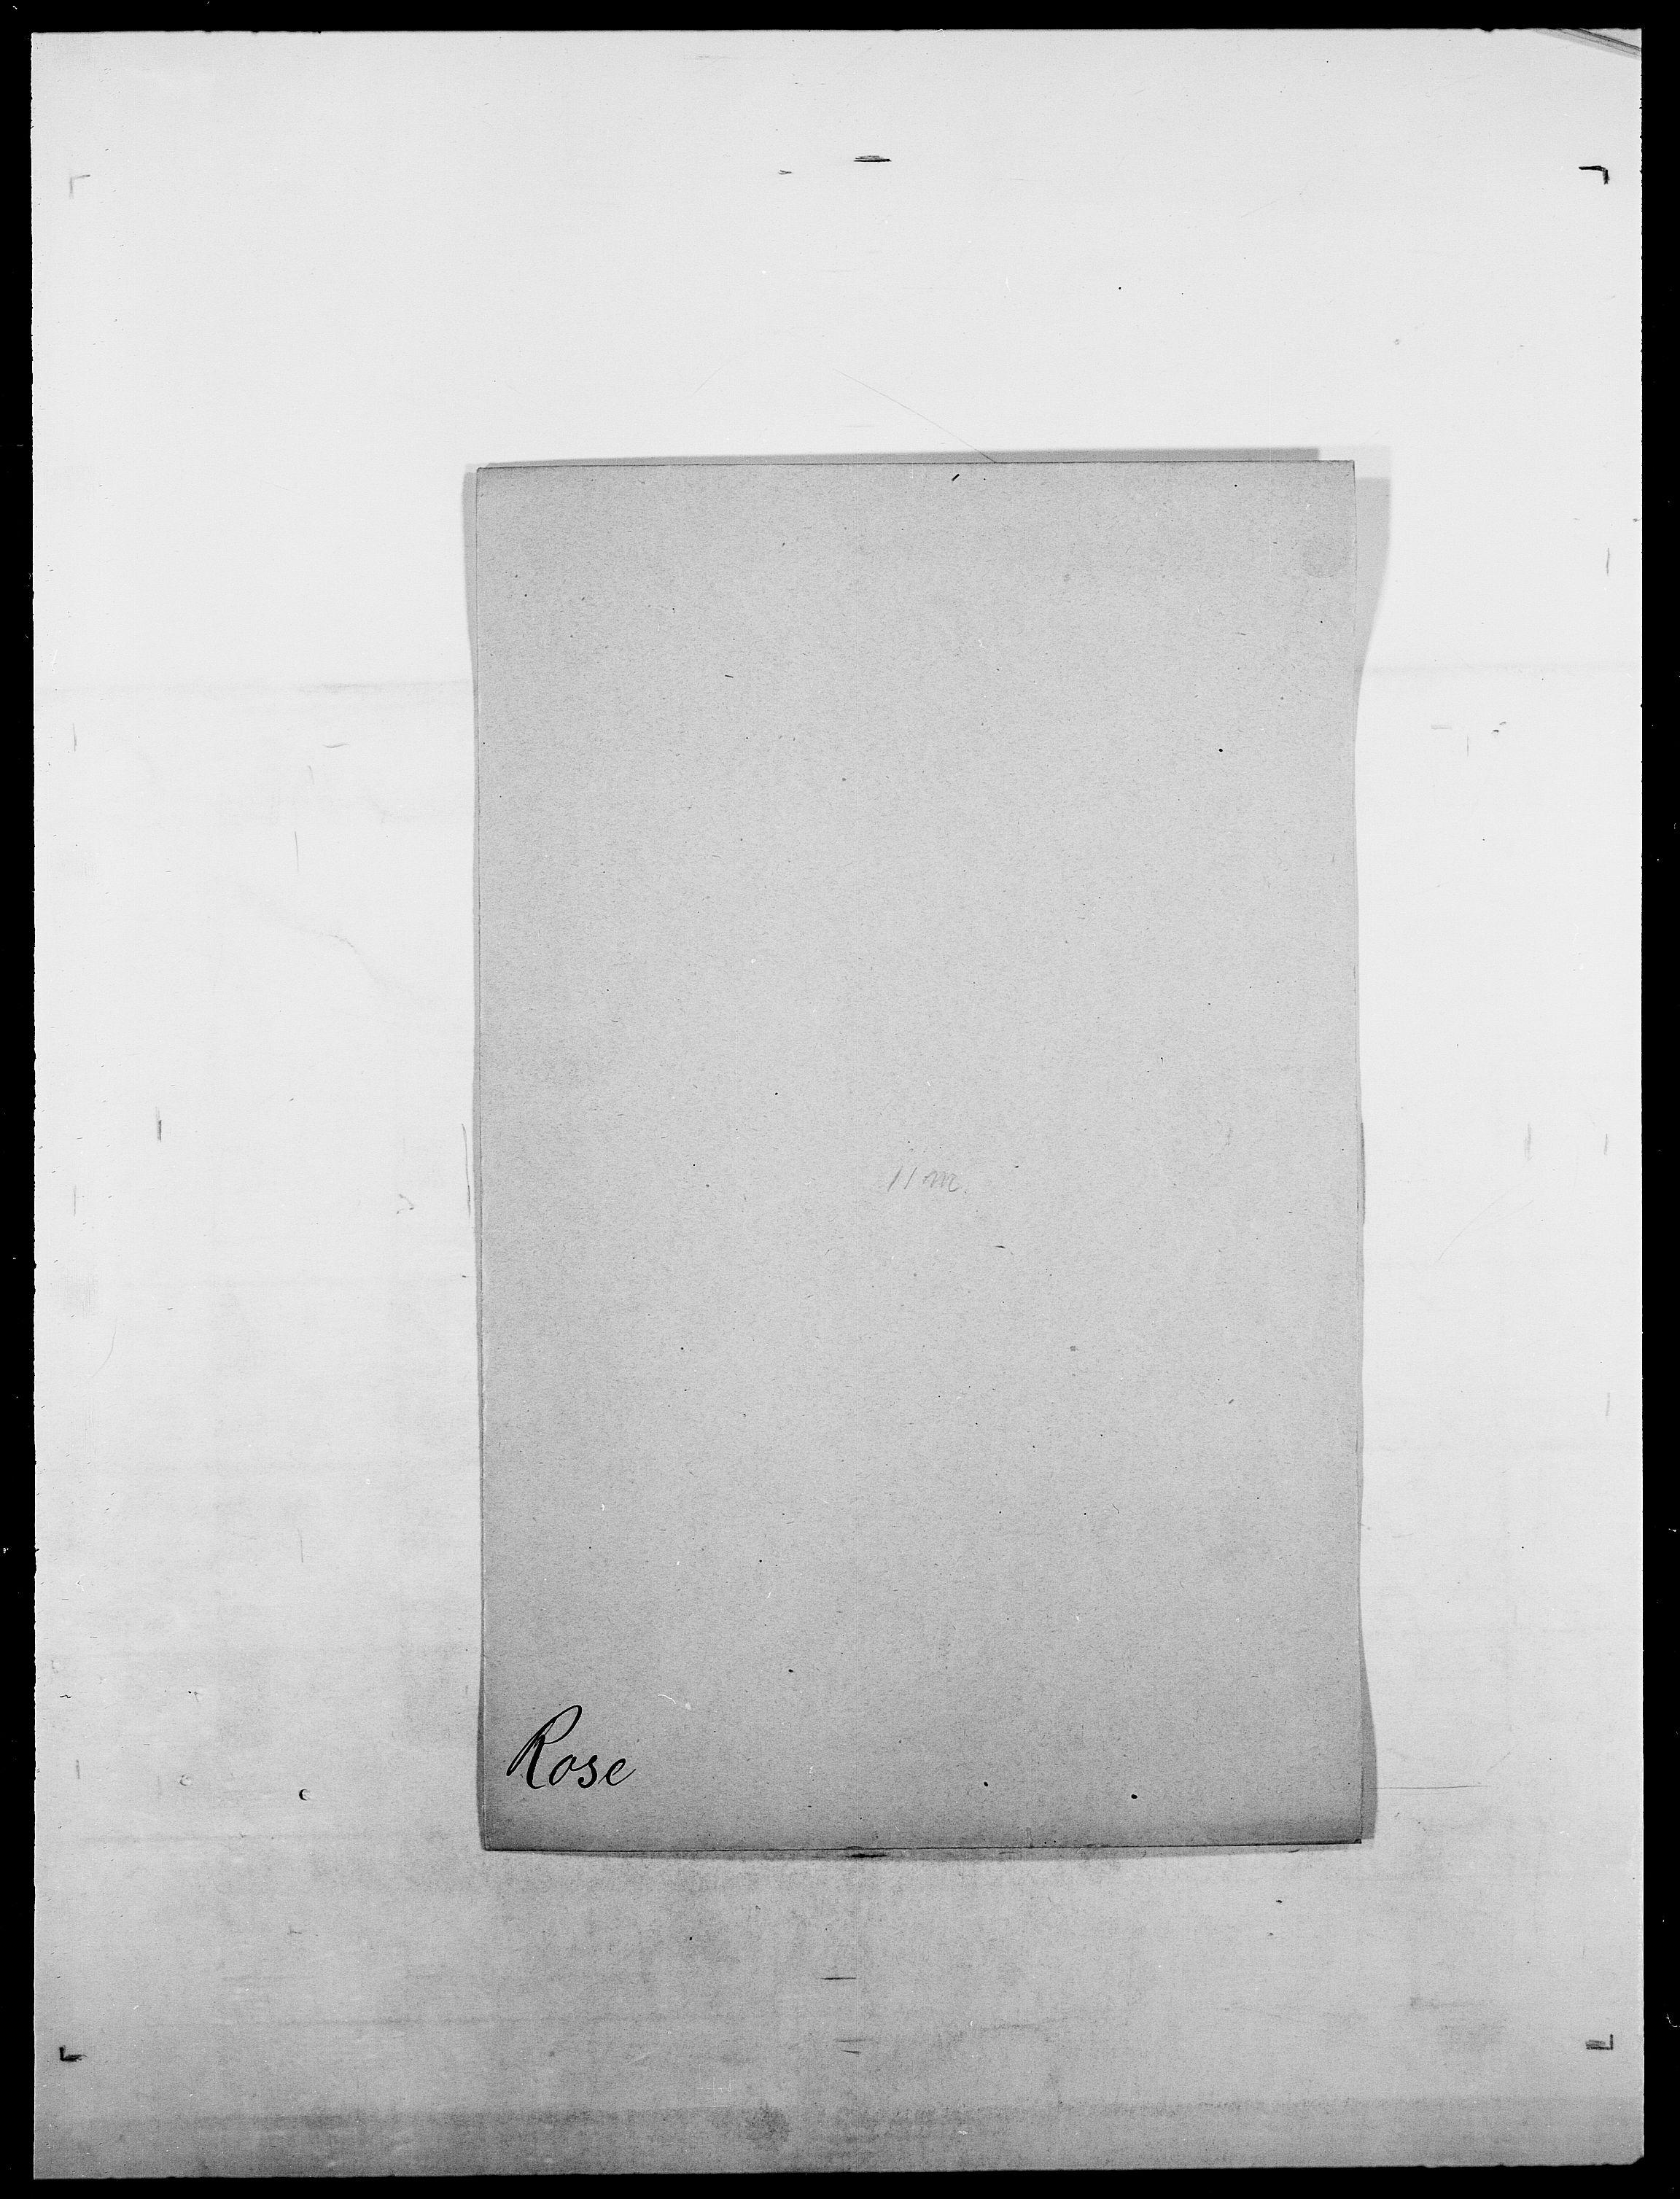 SAO, Delgobe, Charles Antoine - samling, D/Da/L0033: Roald - Røyem, s. 189